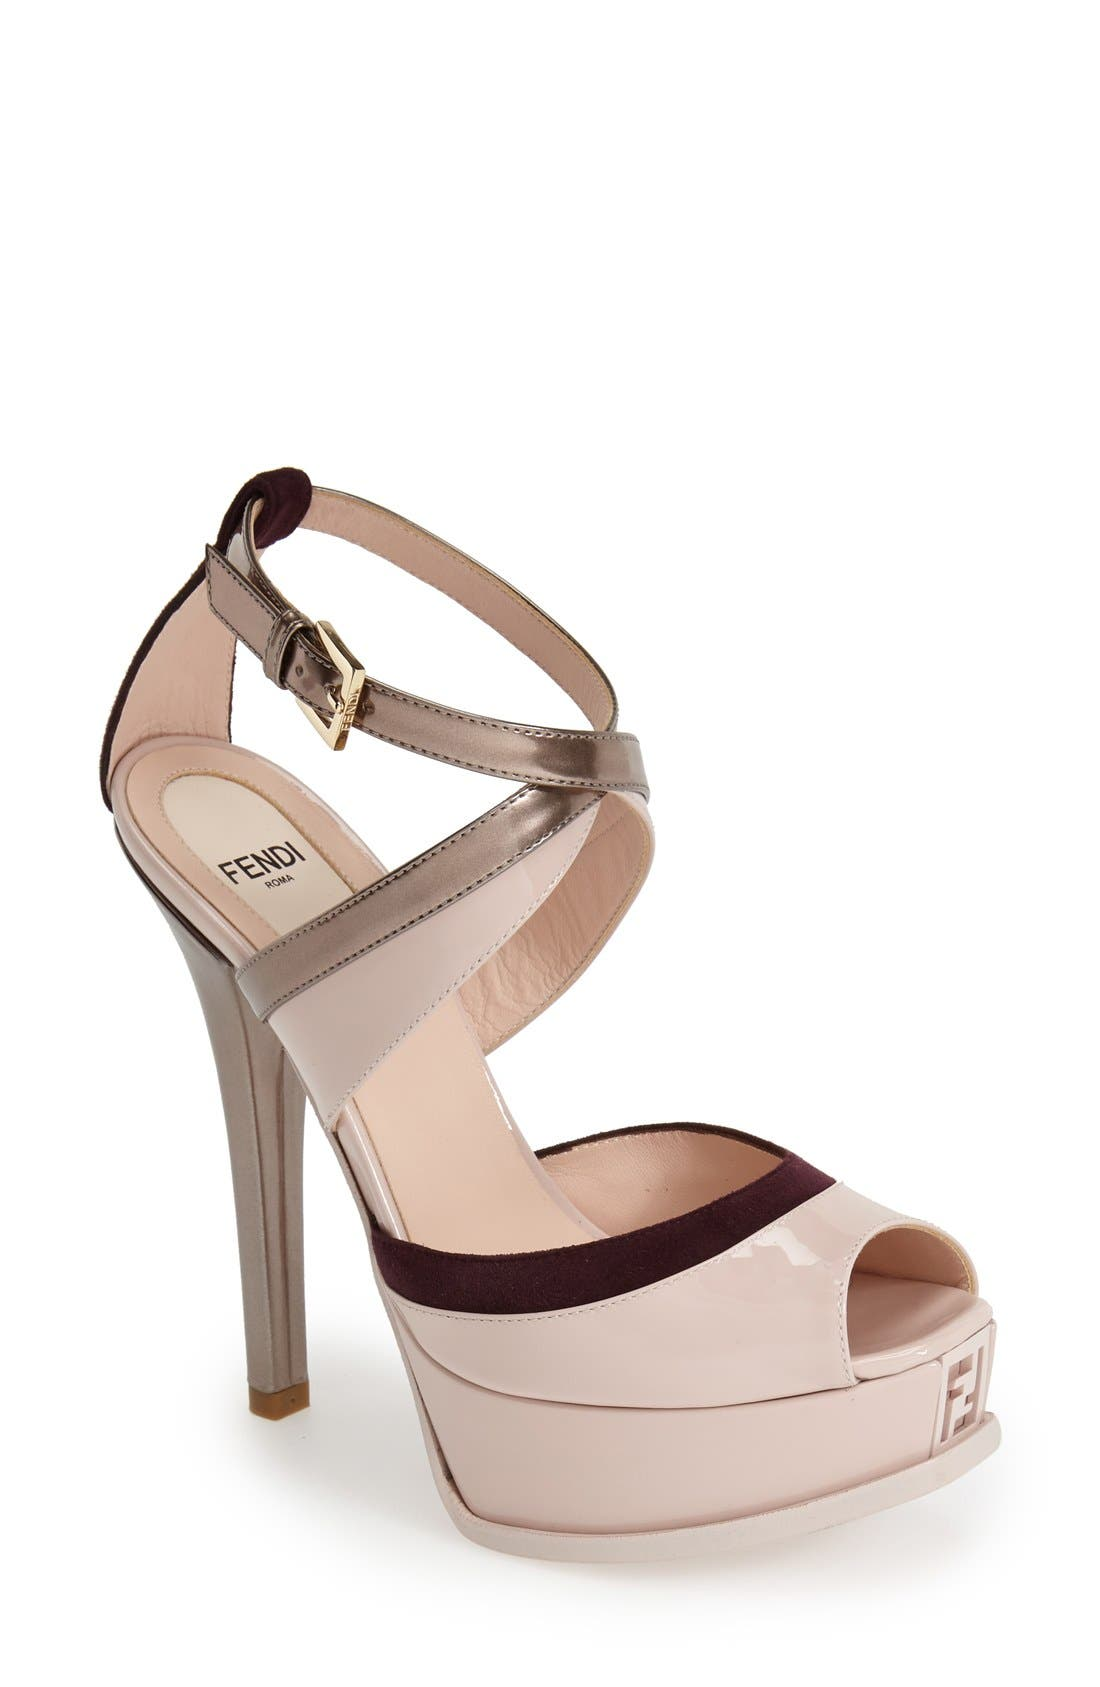 Main Image - Fendi 'Fendista' Platform Sandal (Women)